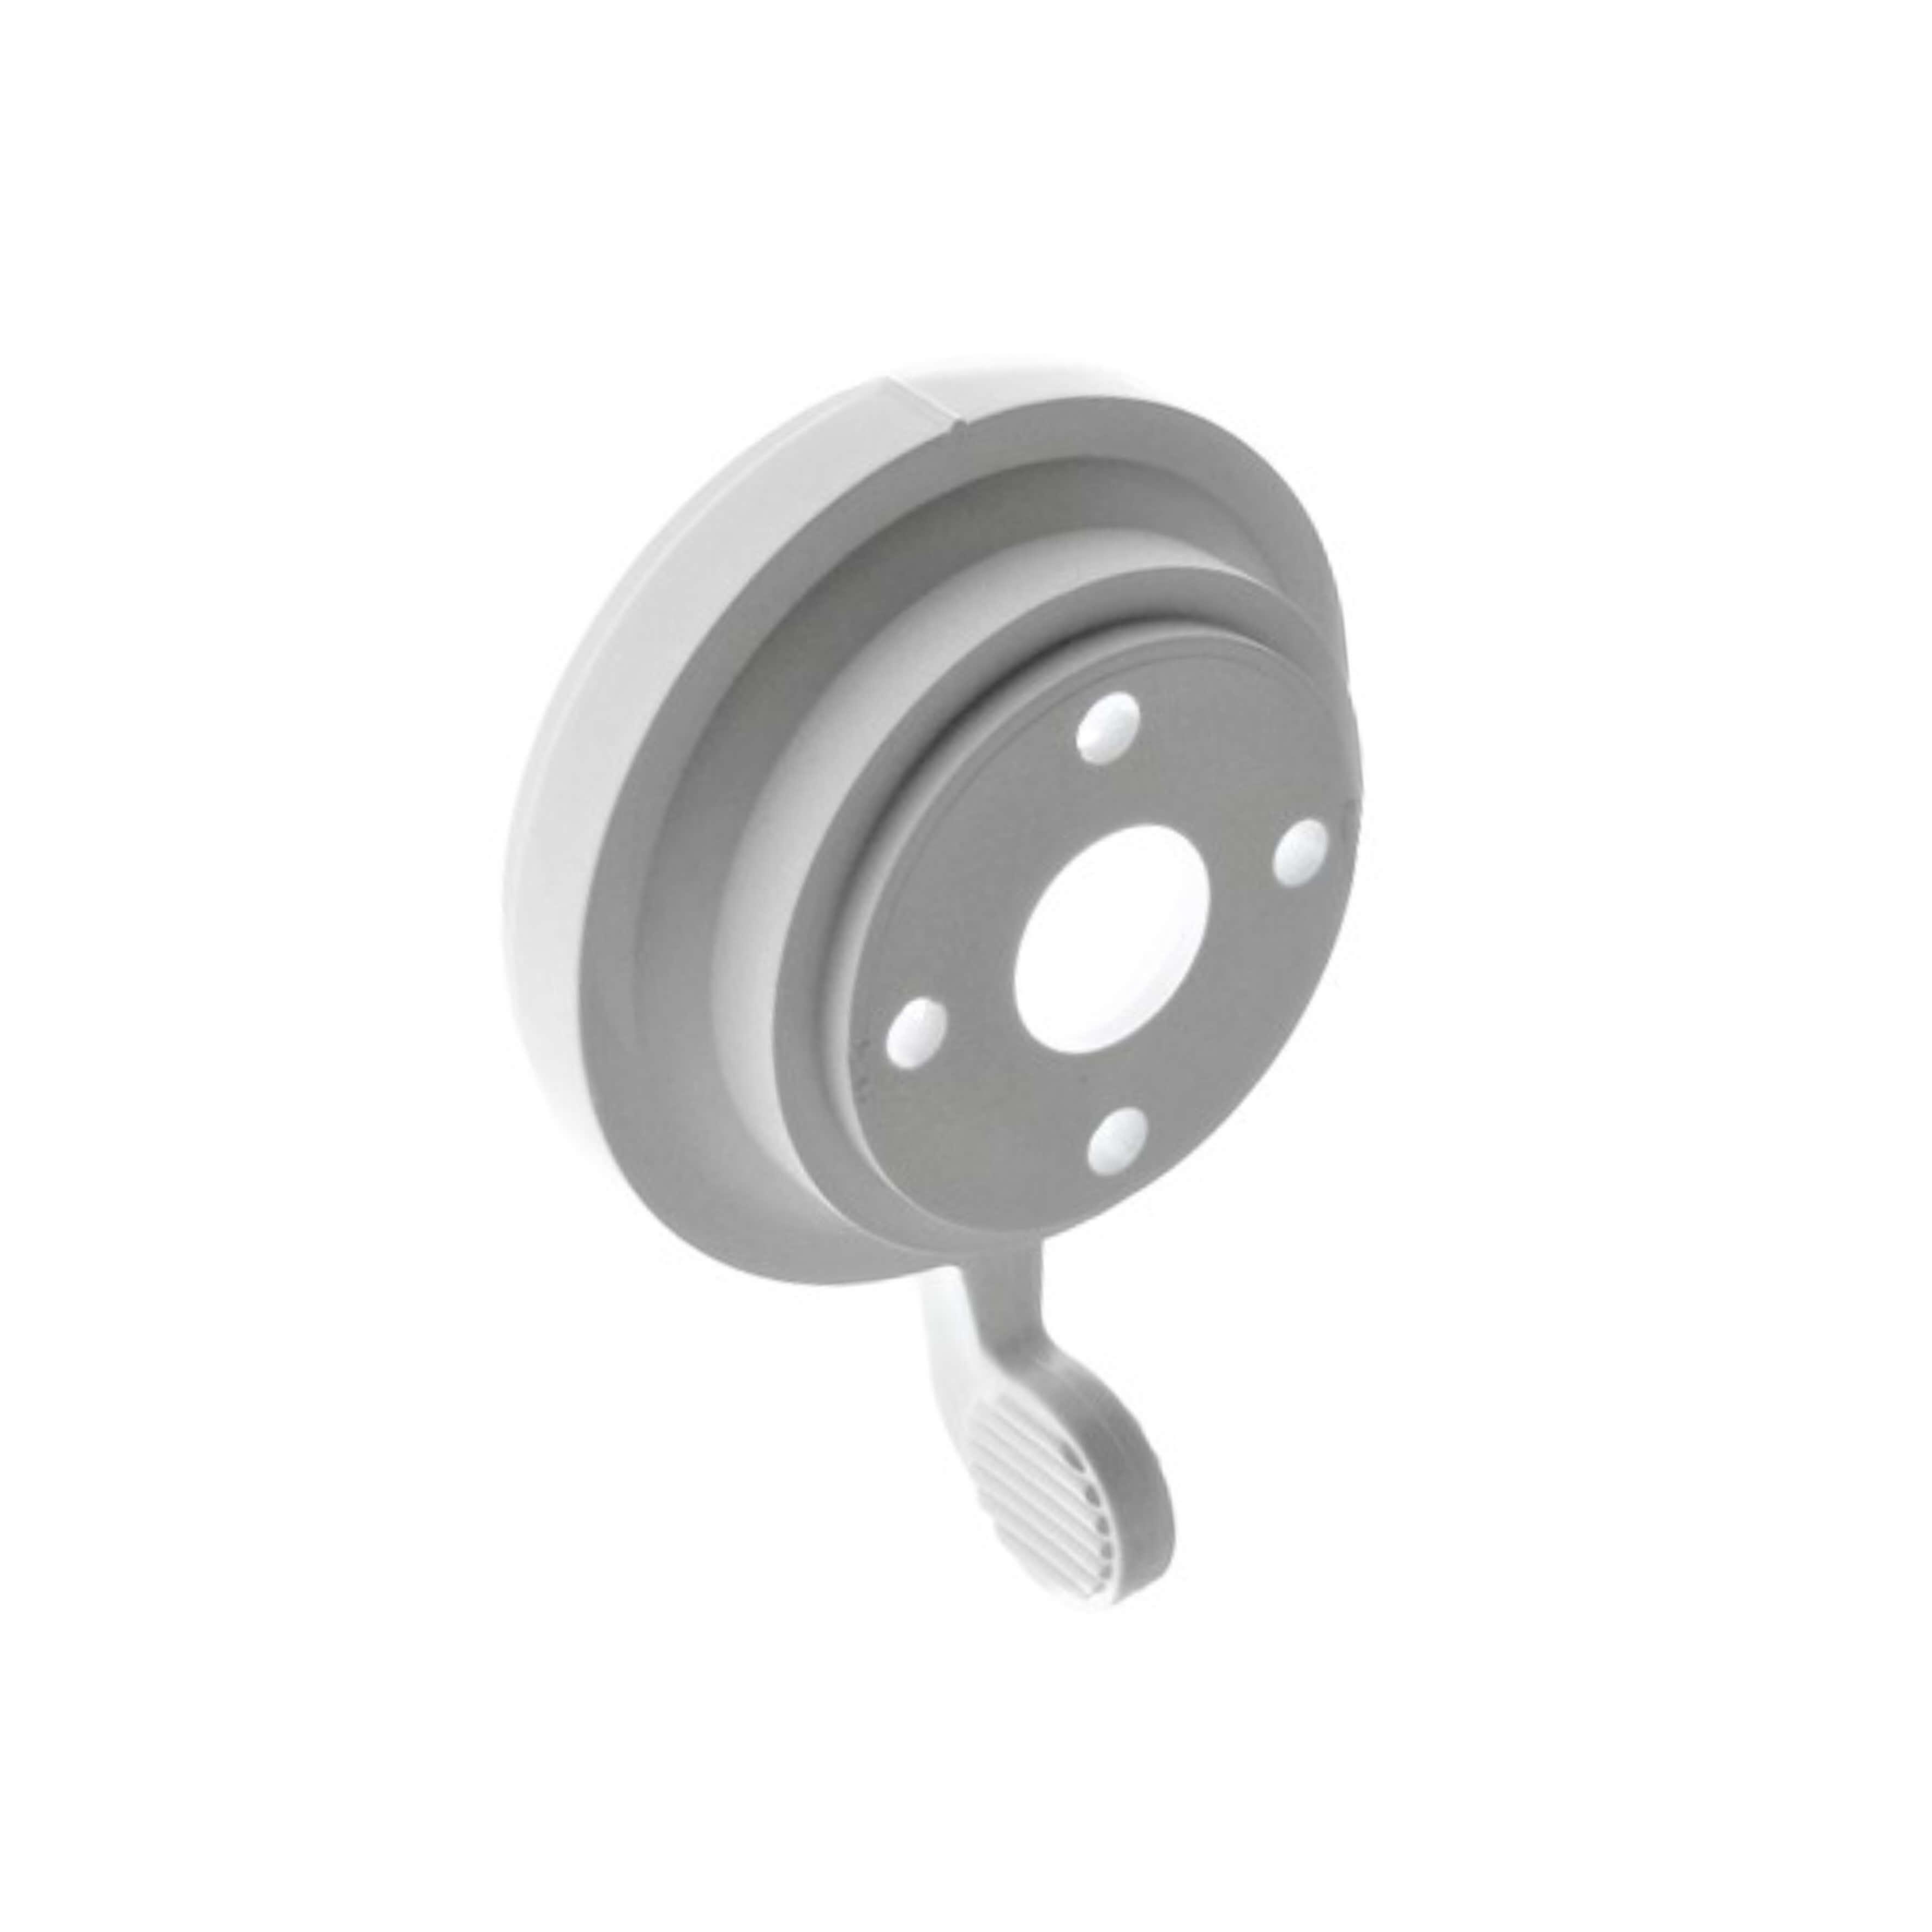 Aqualisa 400 Control Lever White 024502